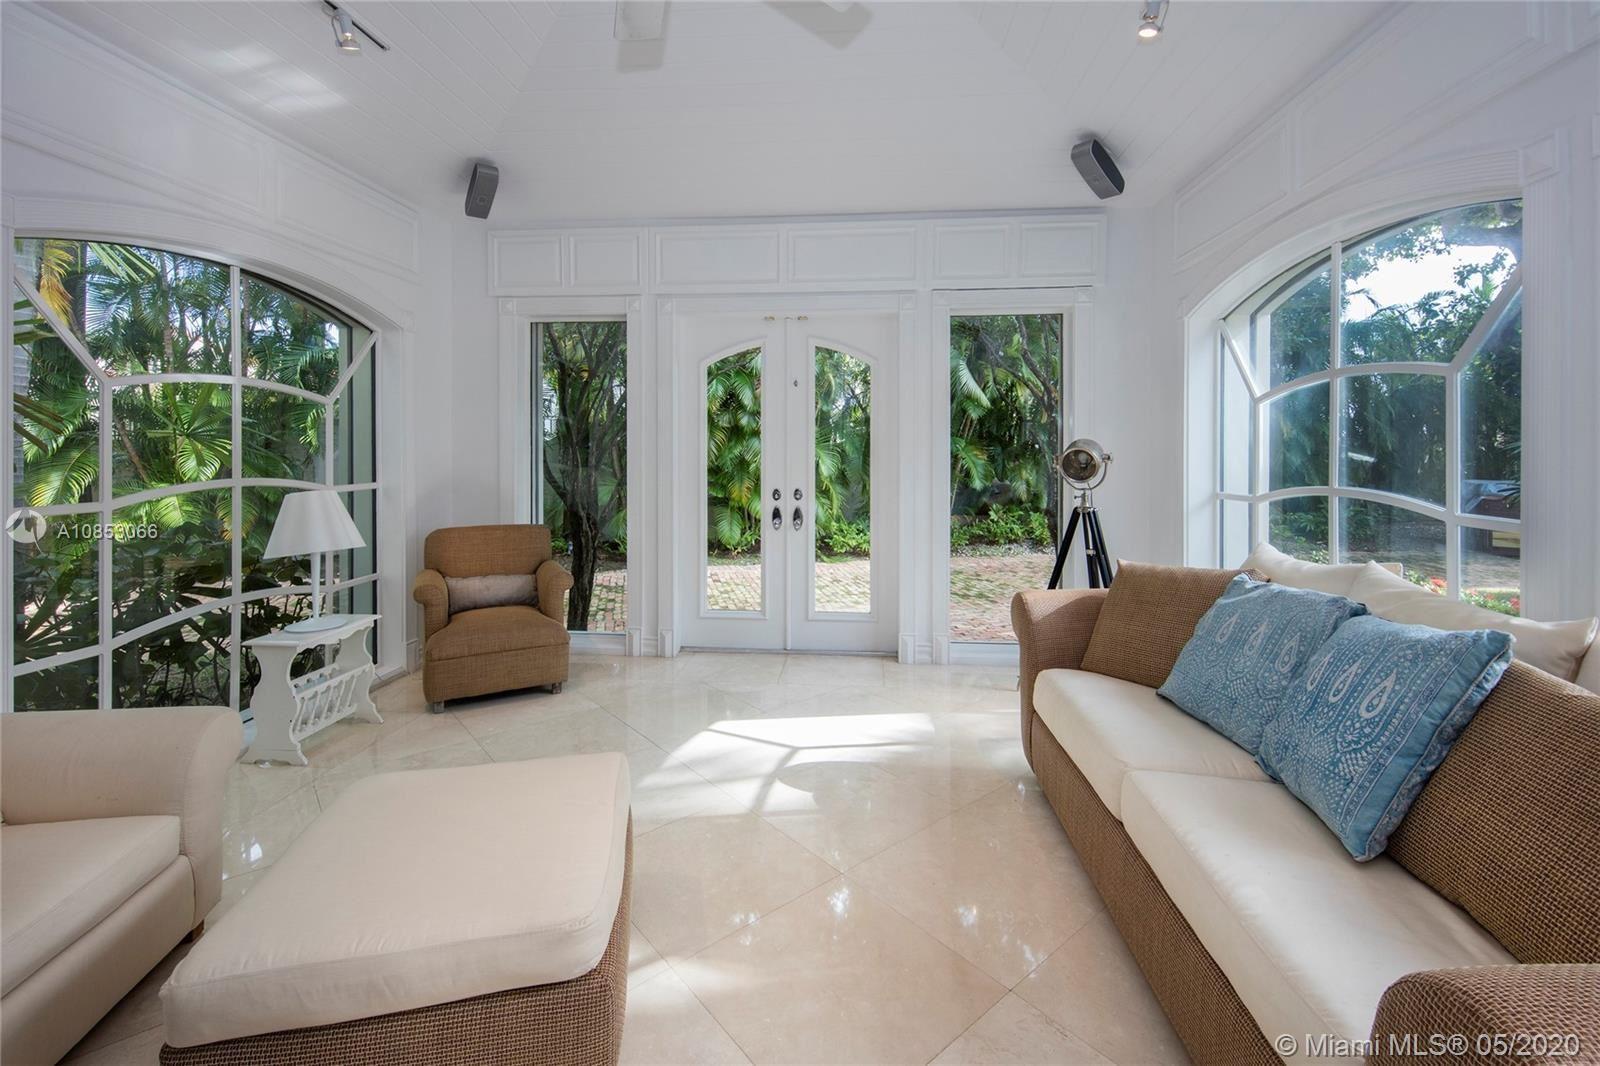 Photo 9 of Listing MLS a10853066 in 1 Star Island Dr Miami Beach FL 33139